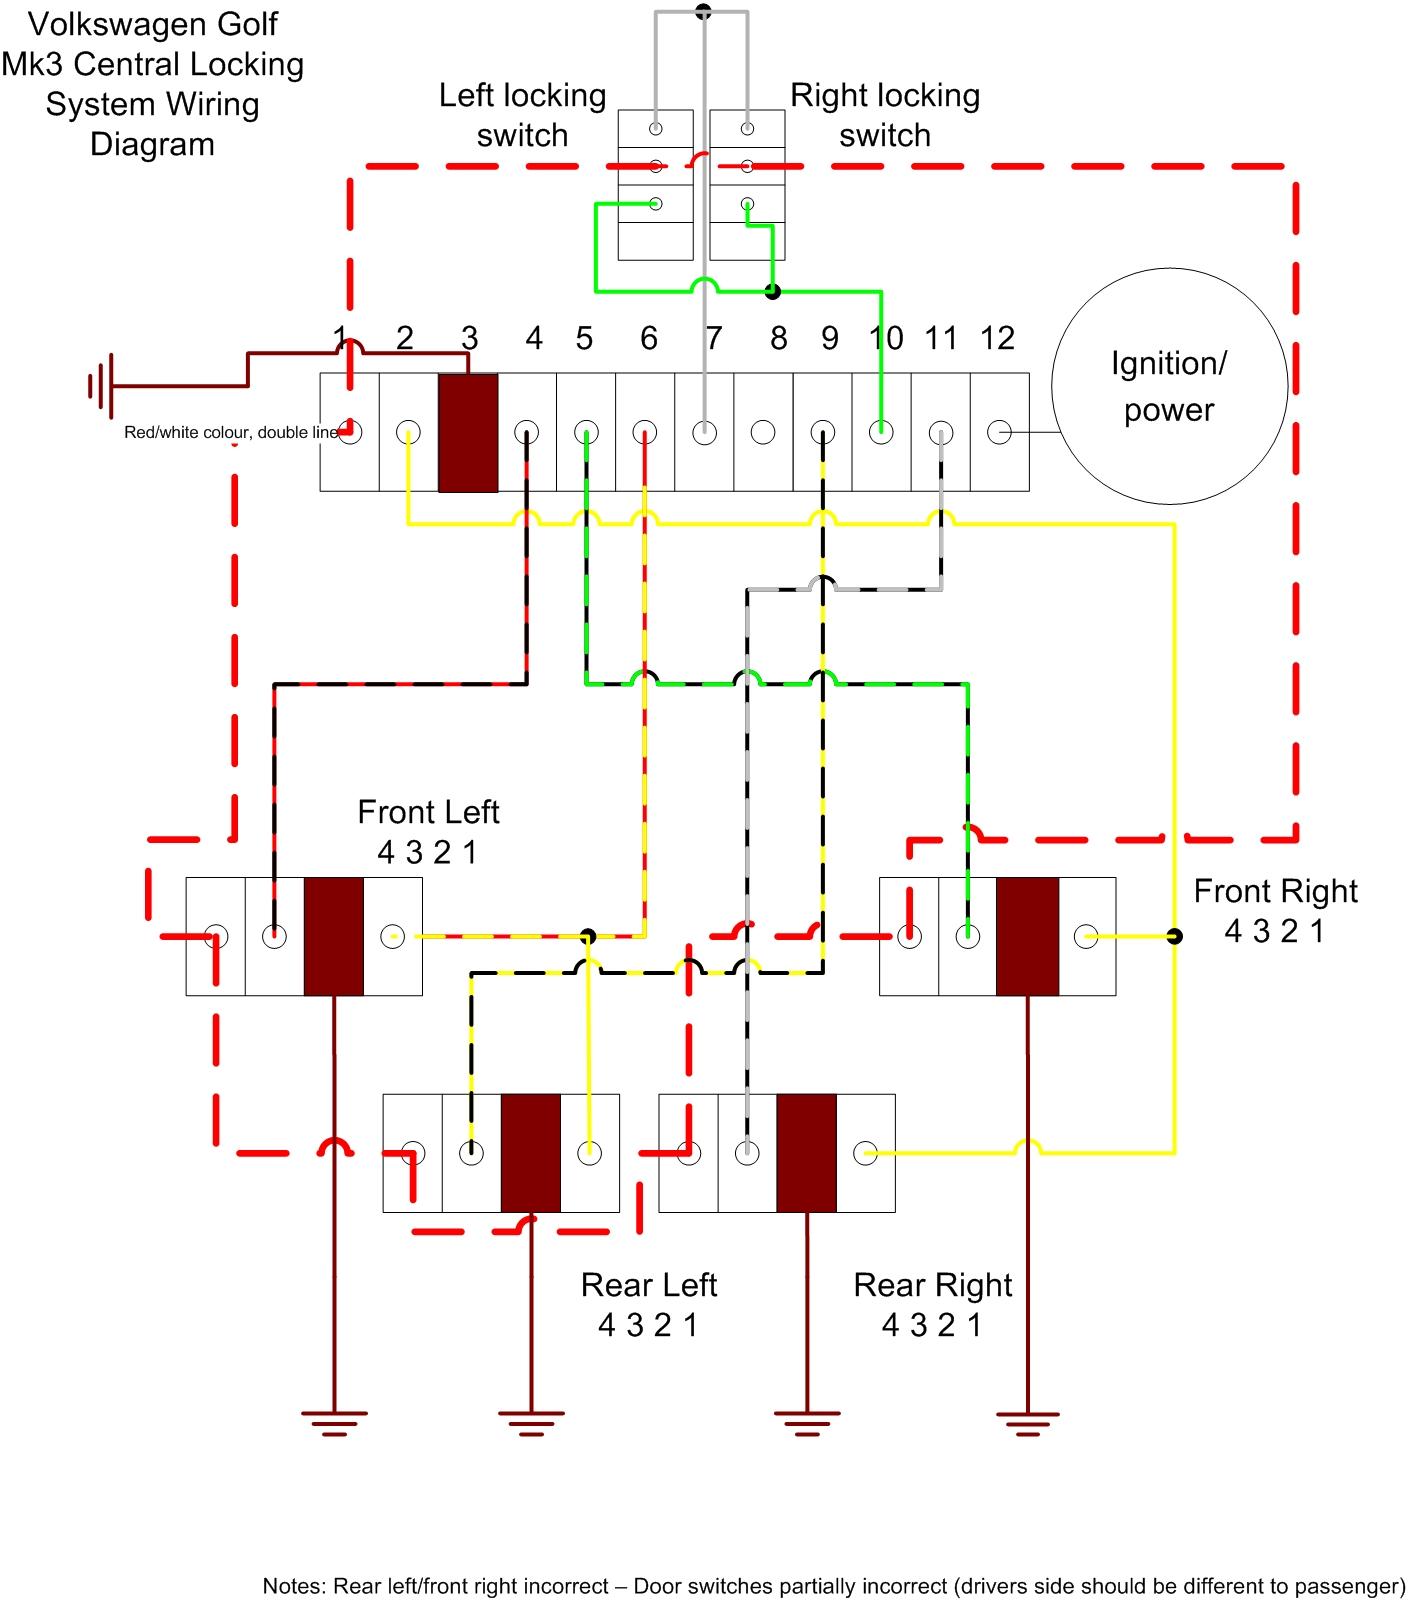 AFE7 Vw Polo 6n Central Locking Wiring Diagram | Wiring ResourcesWiring Resources